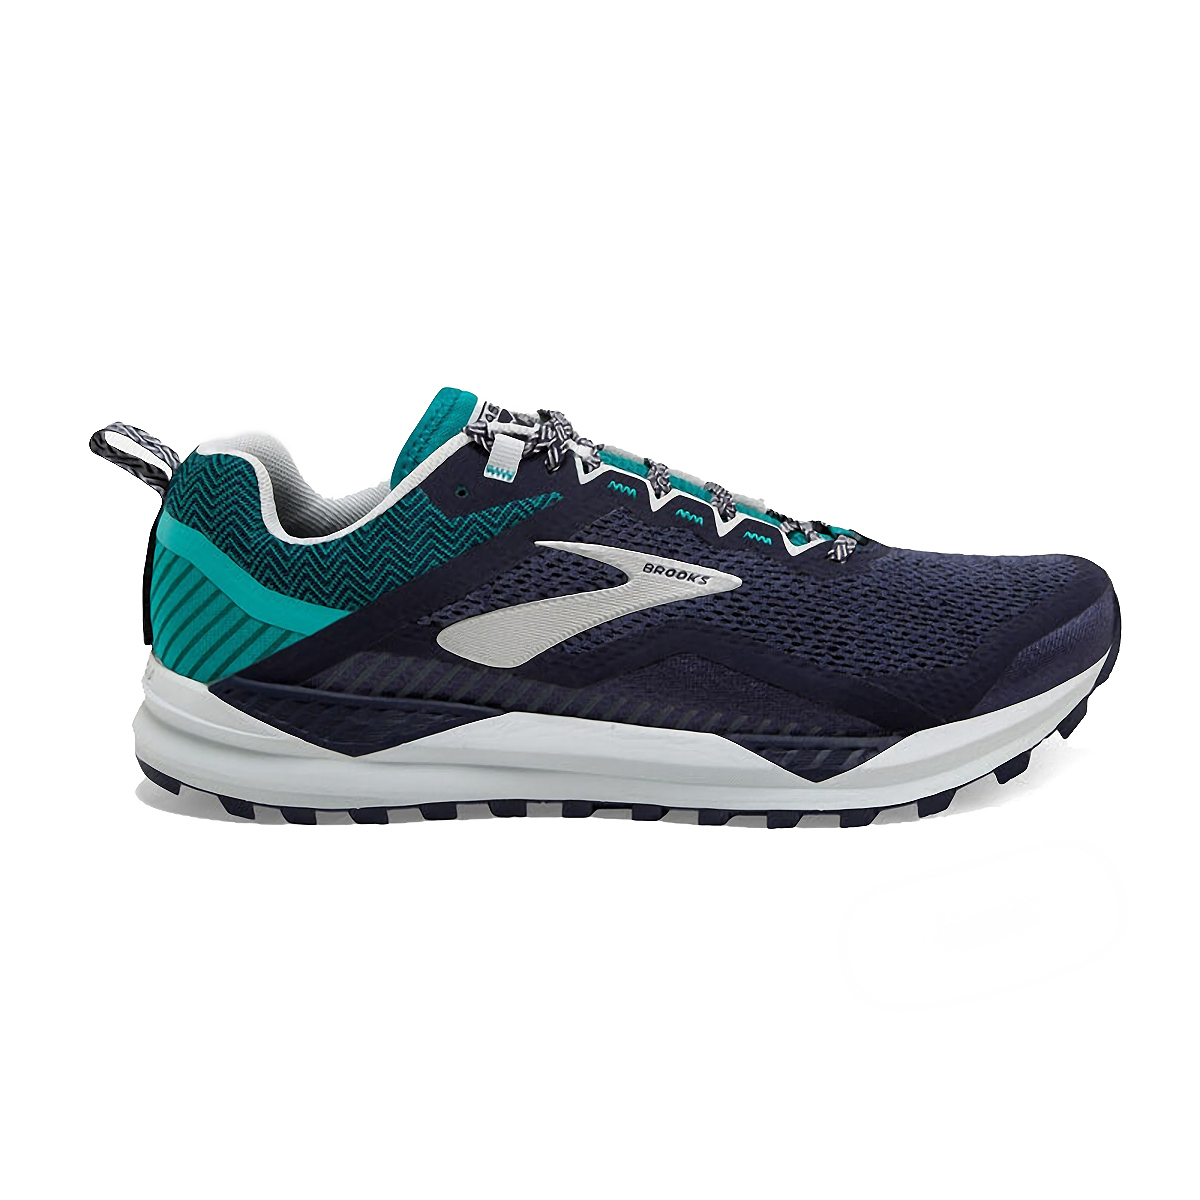 Men's Brooks Cascadia 14 Trail Running Shoe - Color: Navy/Blue Grass - Size: 7 - Width: Regular, Navy/Blue Grass, large, image 1